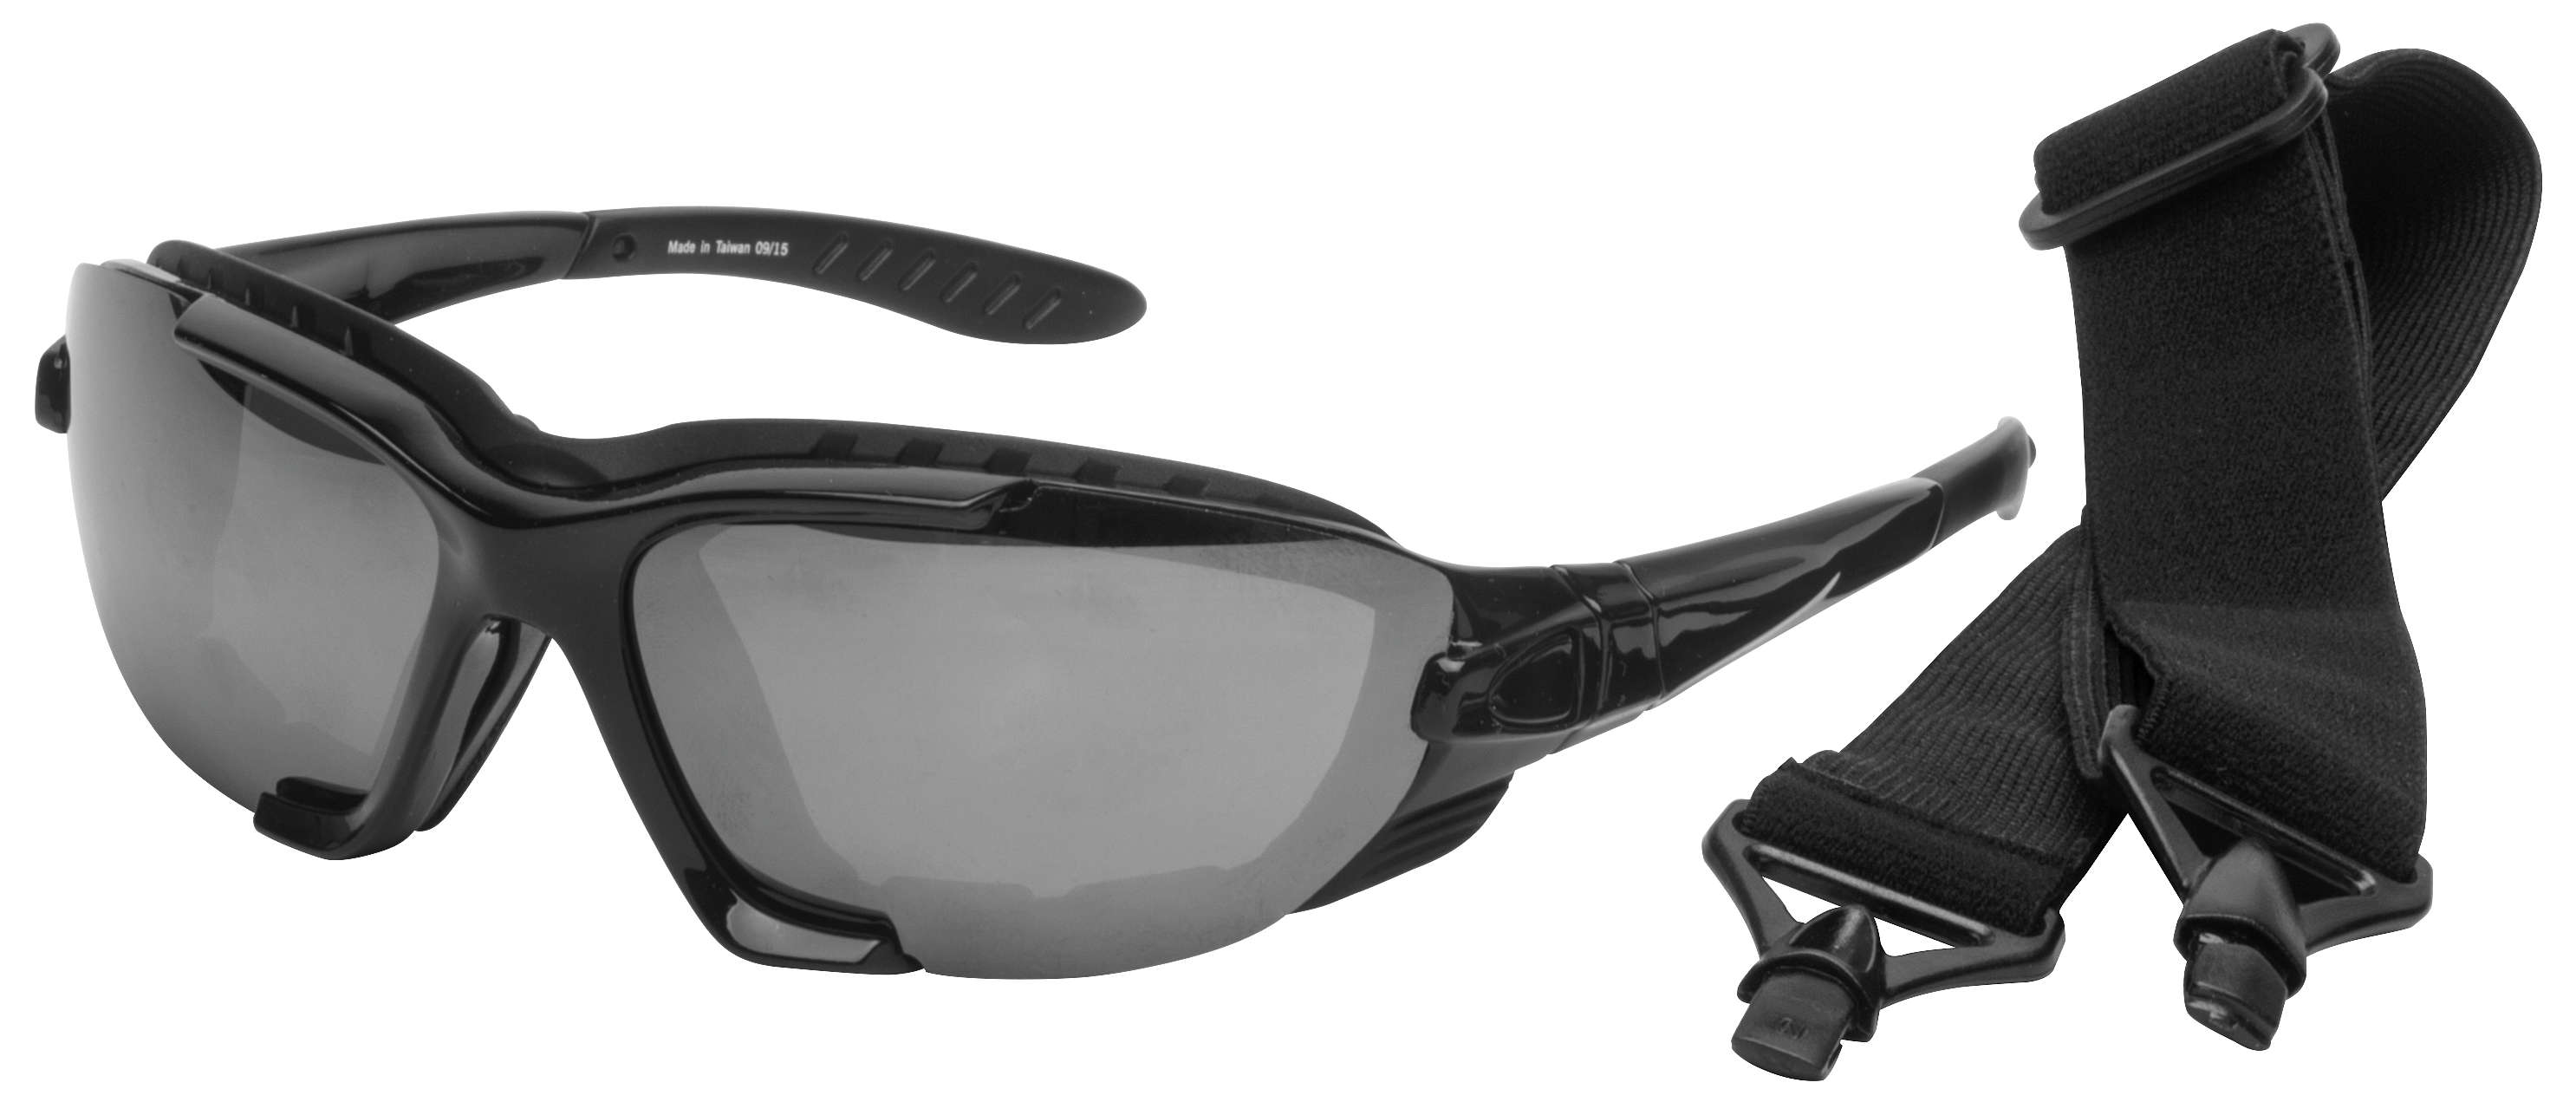 Windscreen Convertible Sunglasses Kit